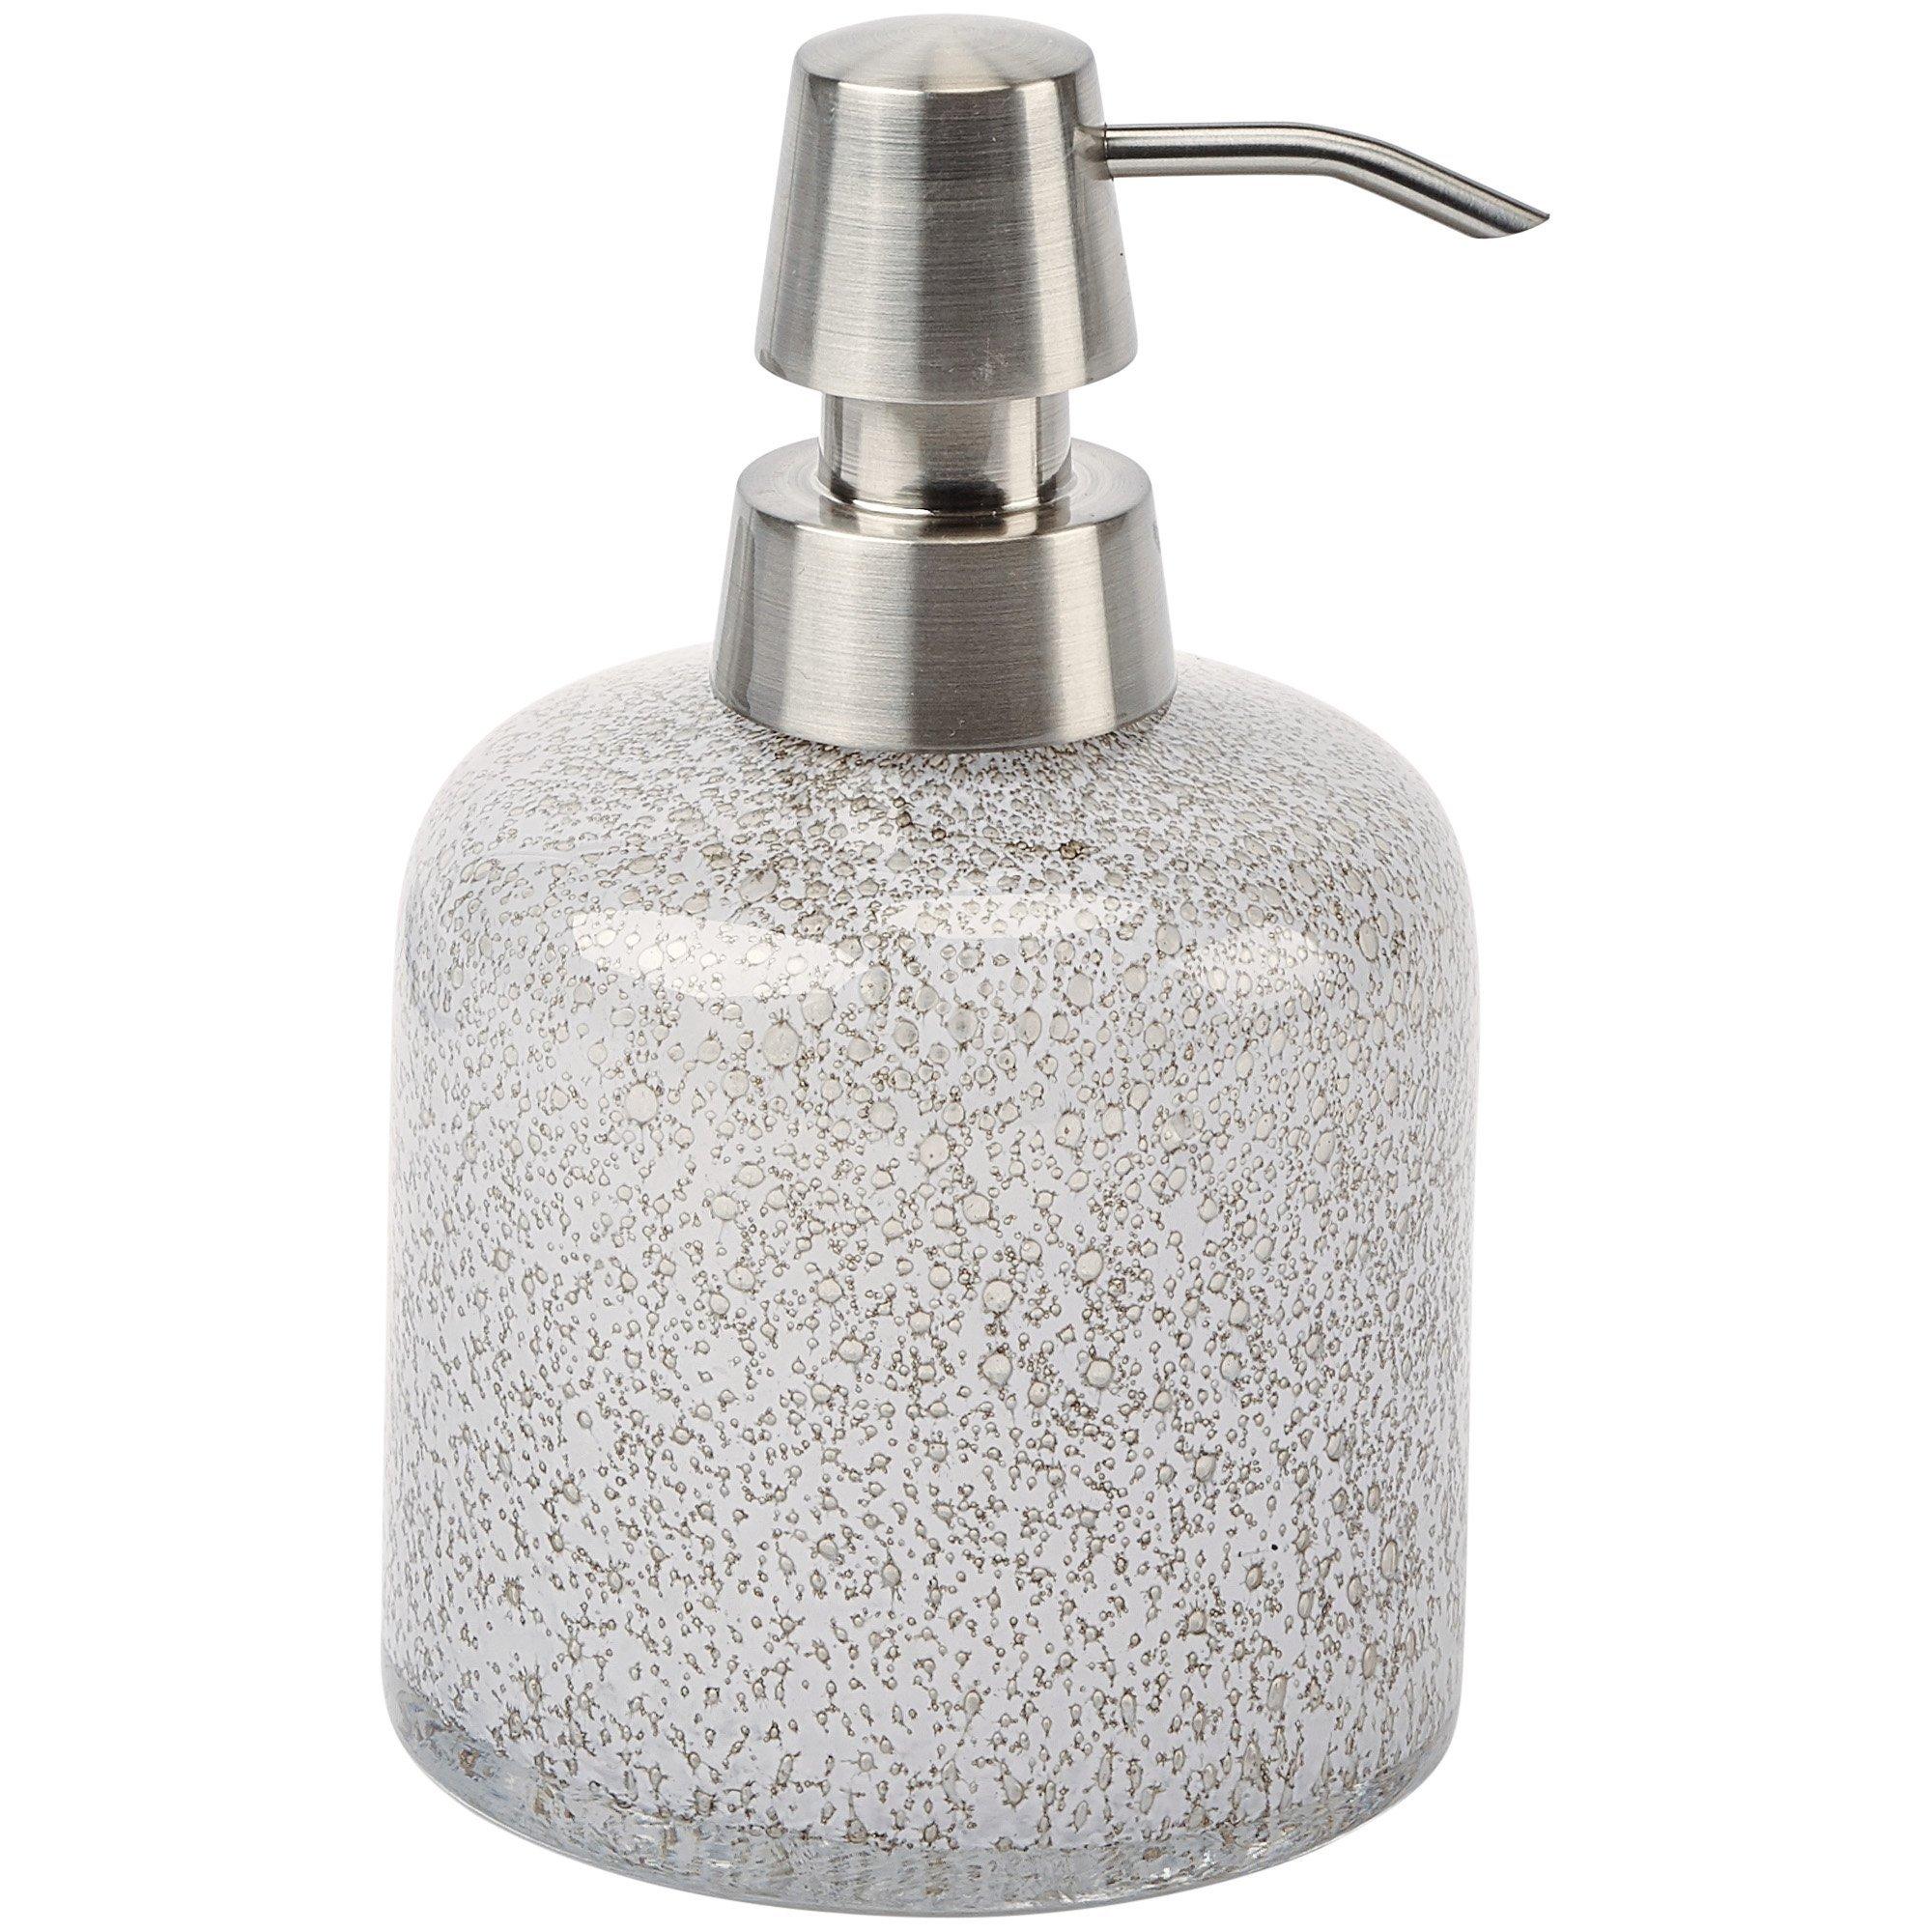 Fyra Round Bathroom or Kitchen Pump Liquid Soap Lotion Dispenser, Glass (White)